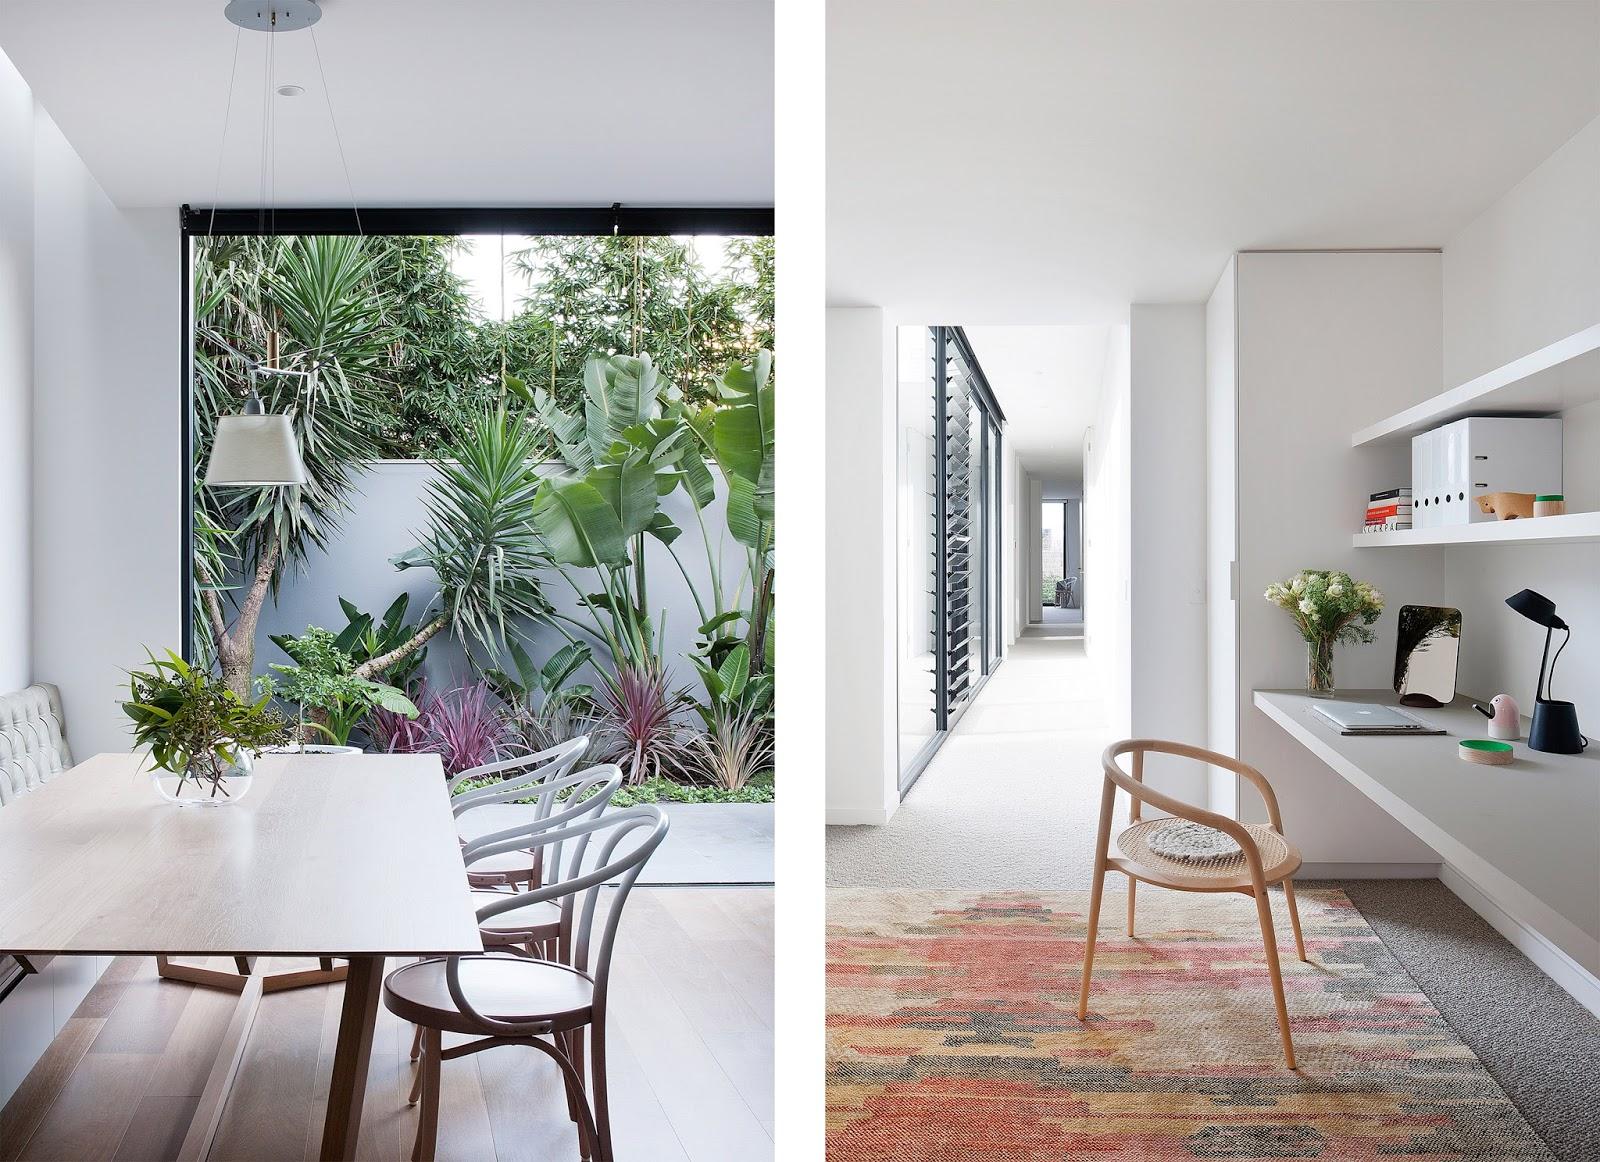 Casa con cortile giardino interno by robson rak architects - Giardino interno casa ...